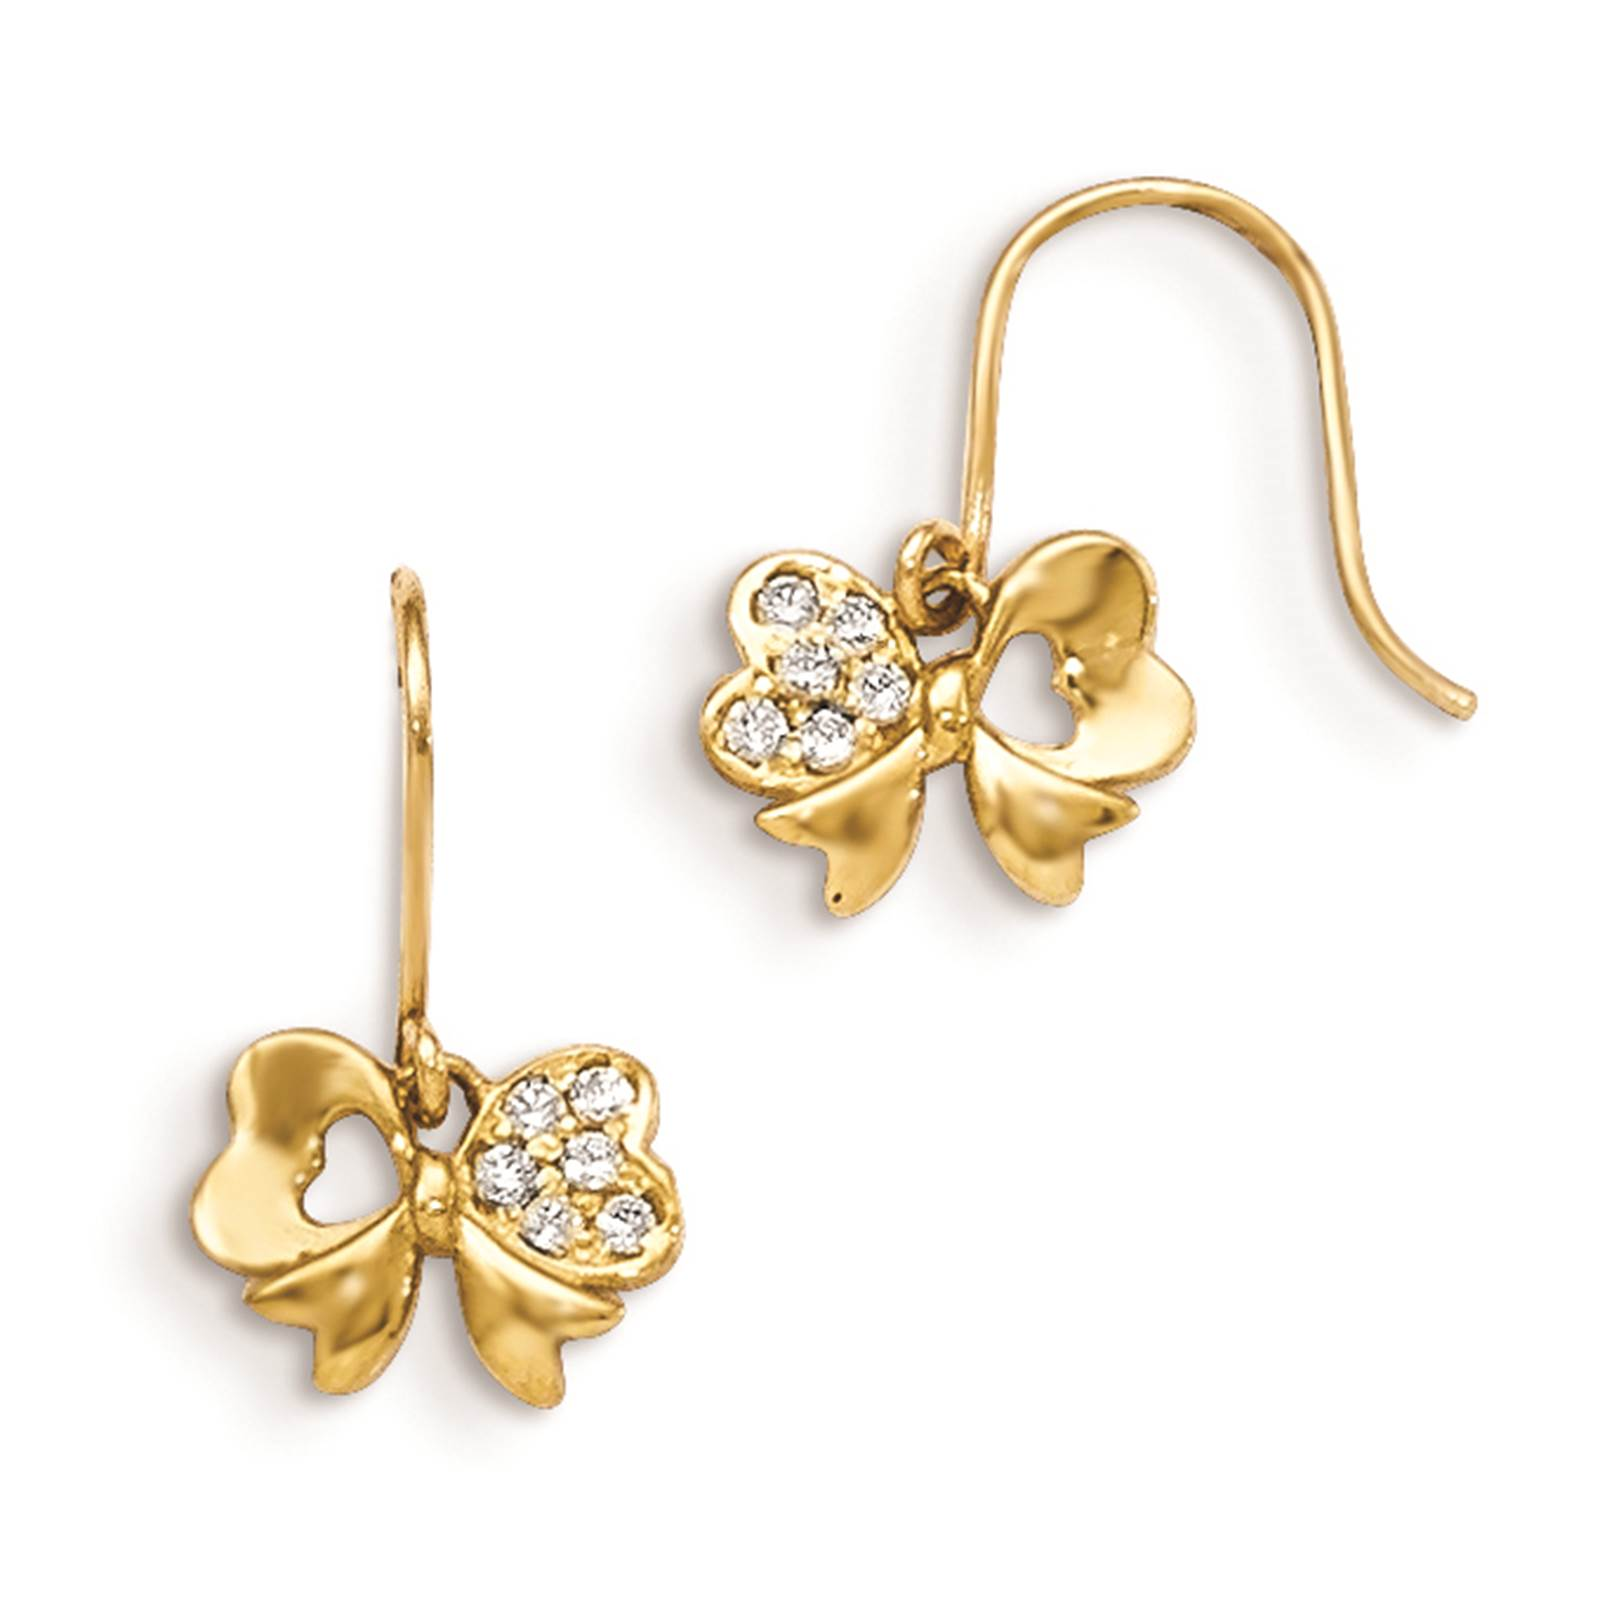 Madi K 14k Yellow Gold Children's Bow Dangle Polished CZ Earrings